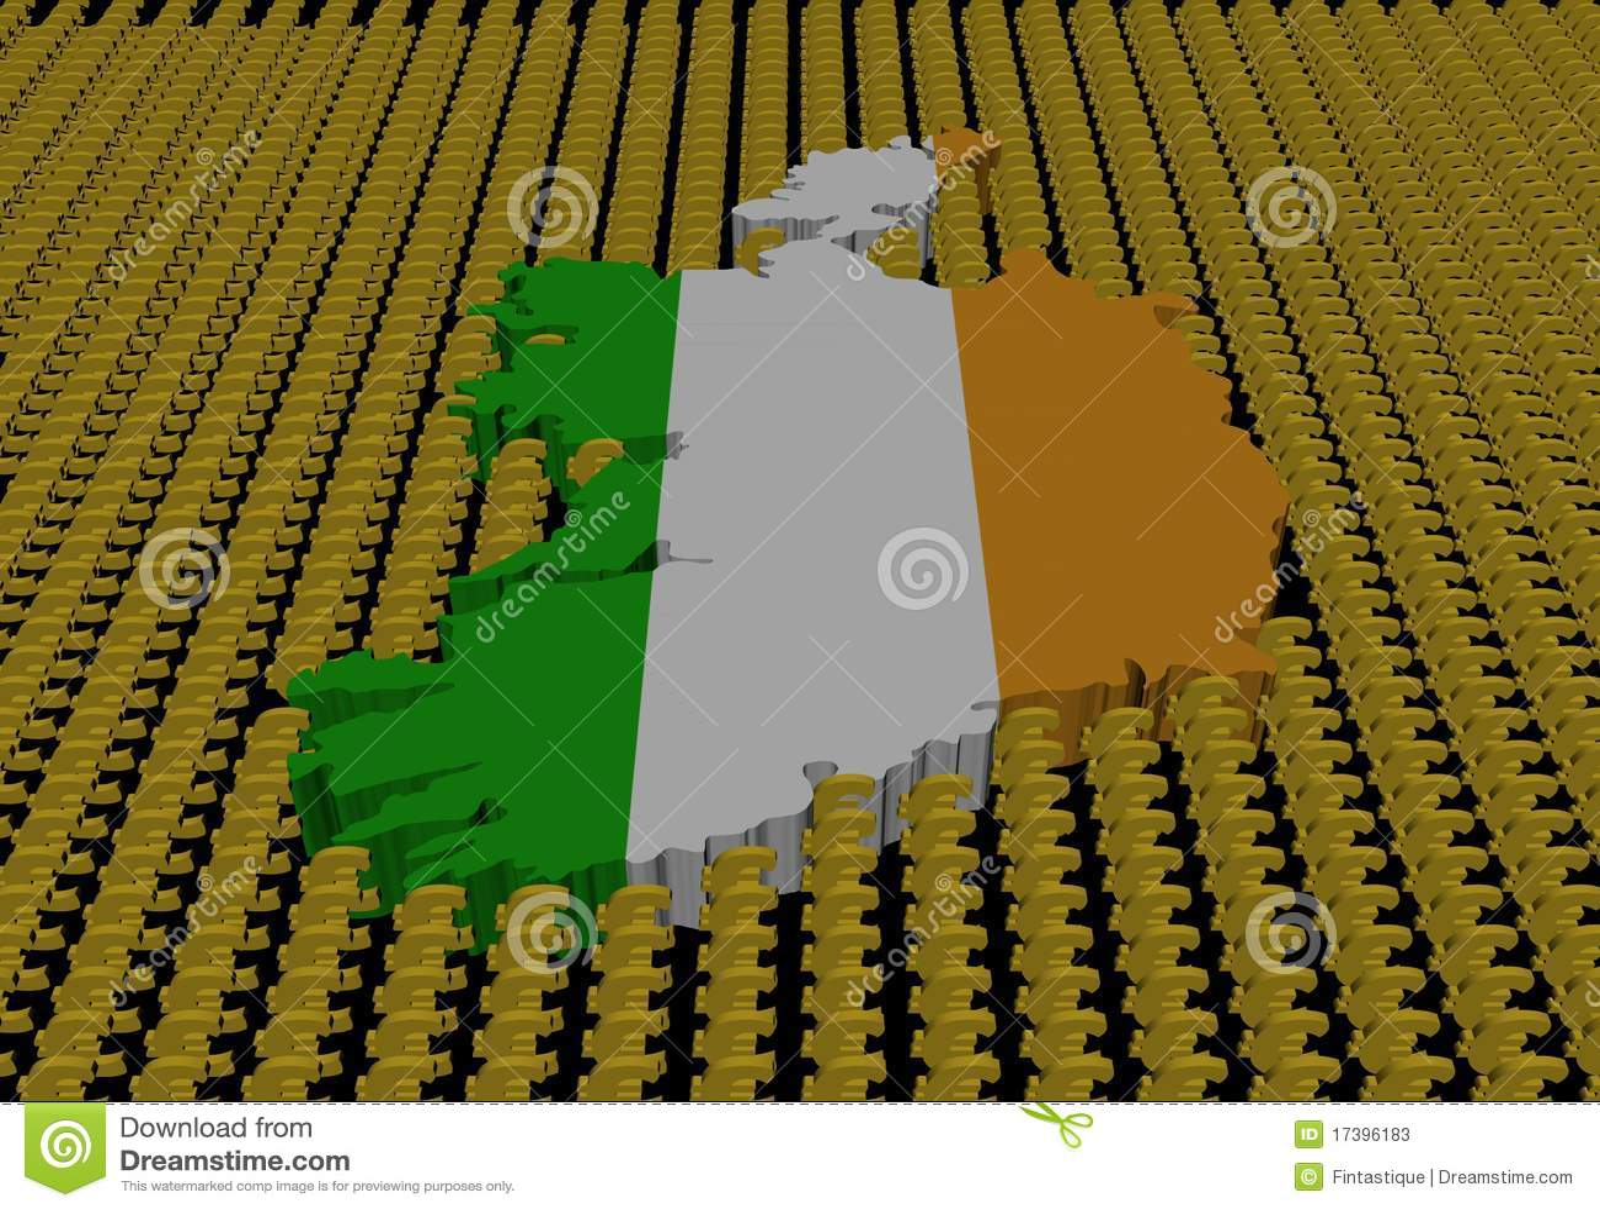 символы карты Ирландии флага евро